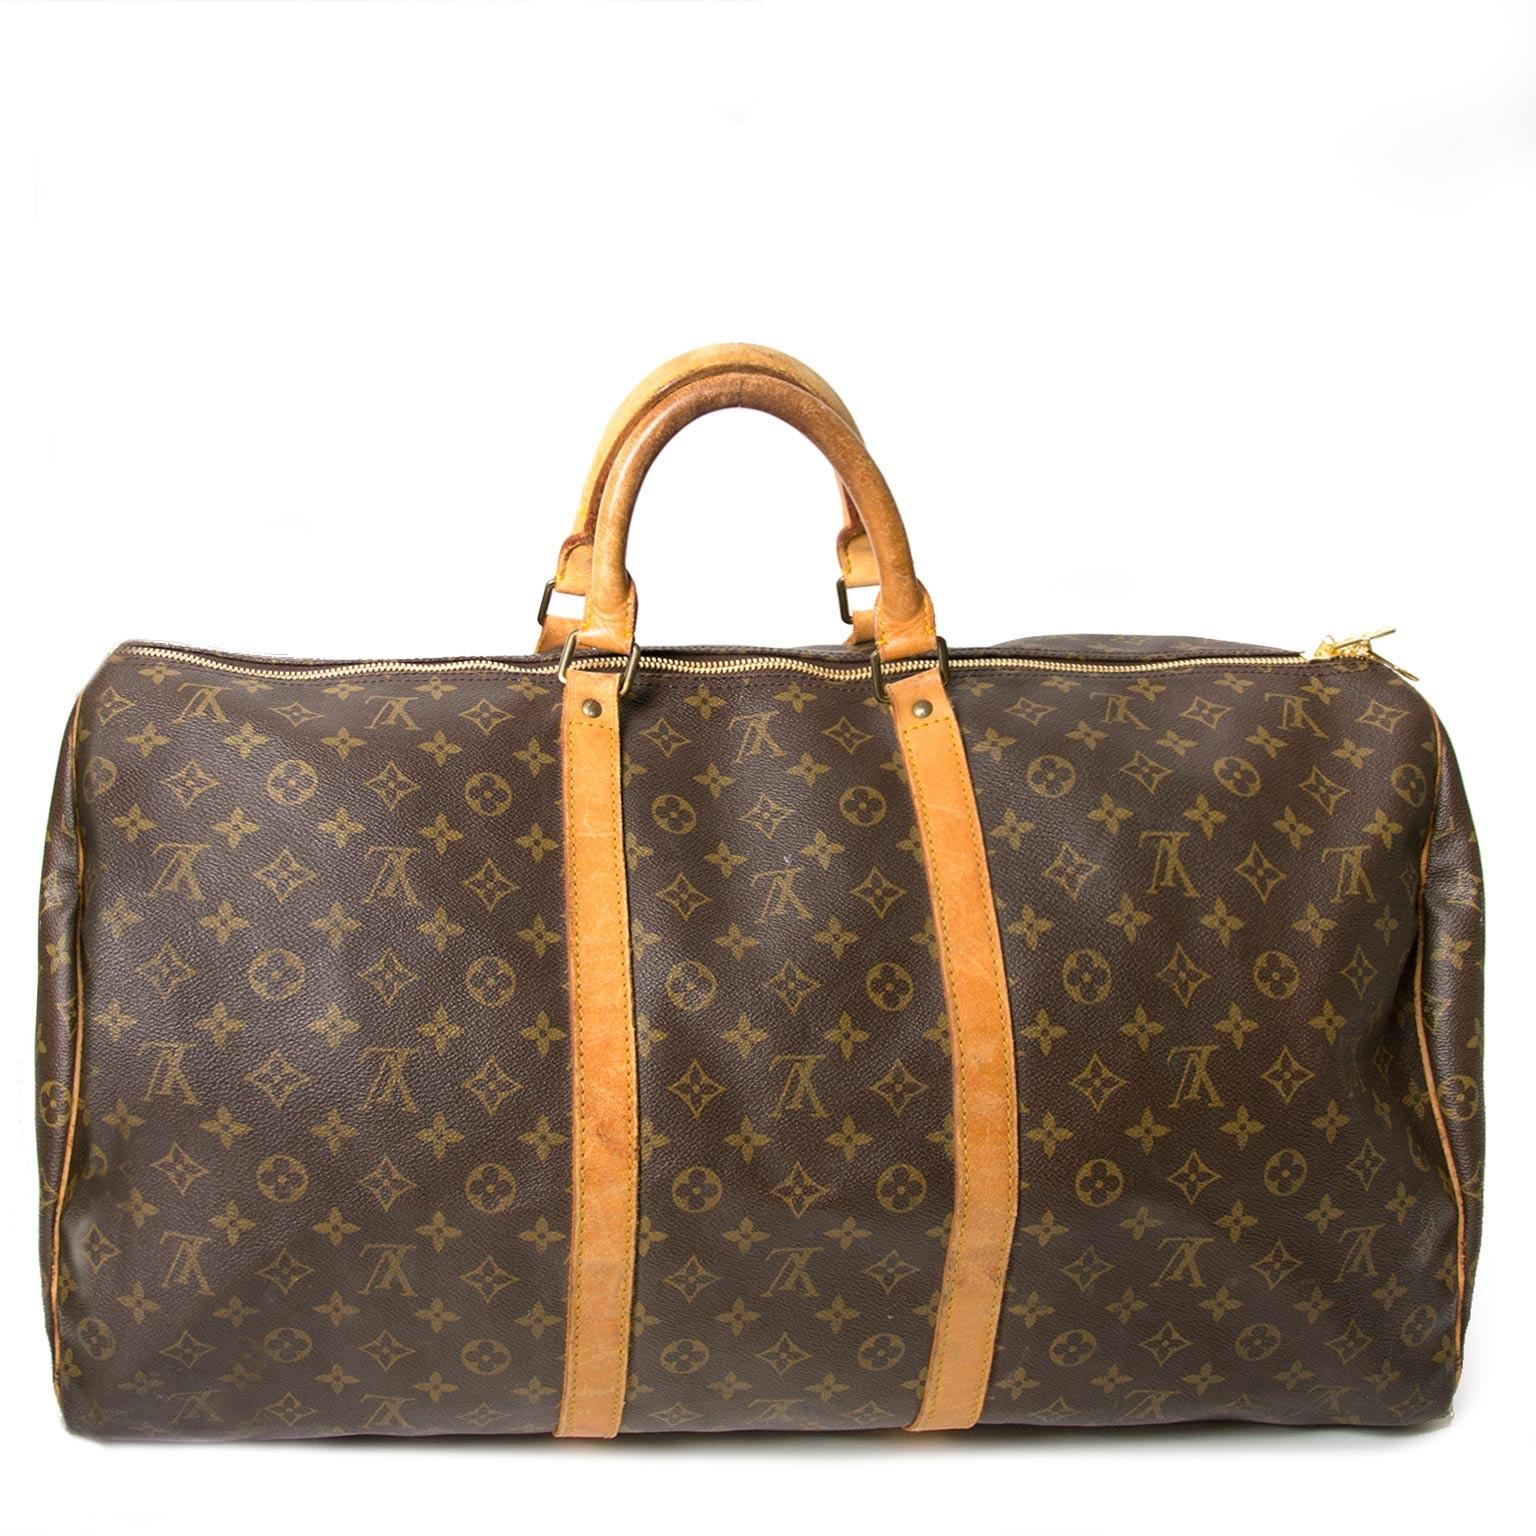 ... louis vuitton monogram keepall 60 now for sale at labellov vintage  fashion webshop belgium 5259bb7d67236